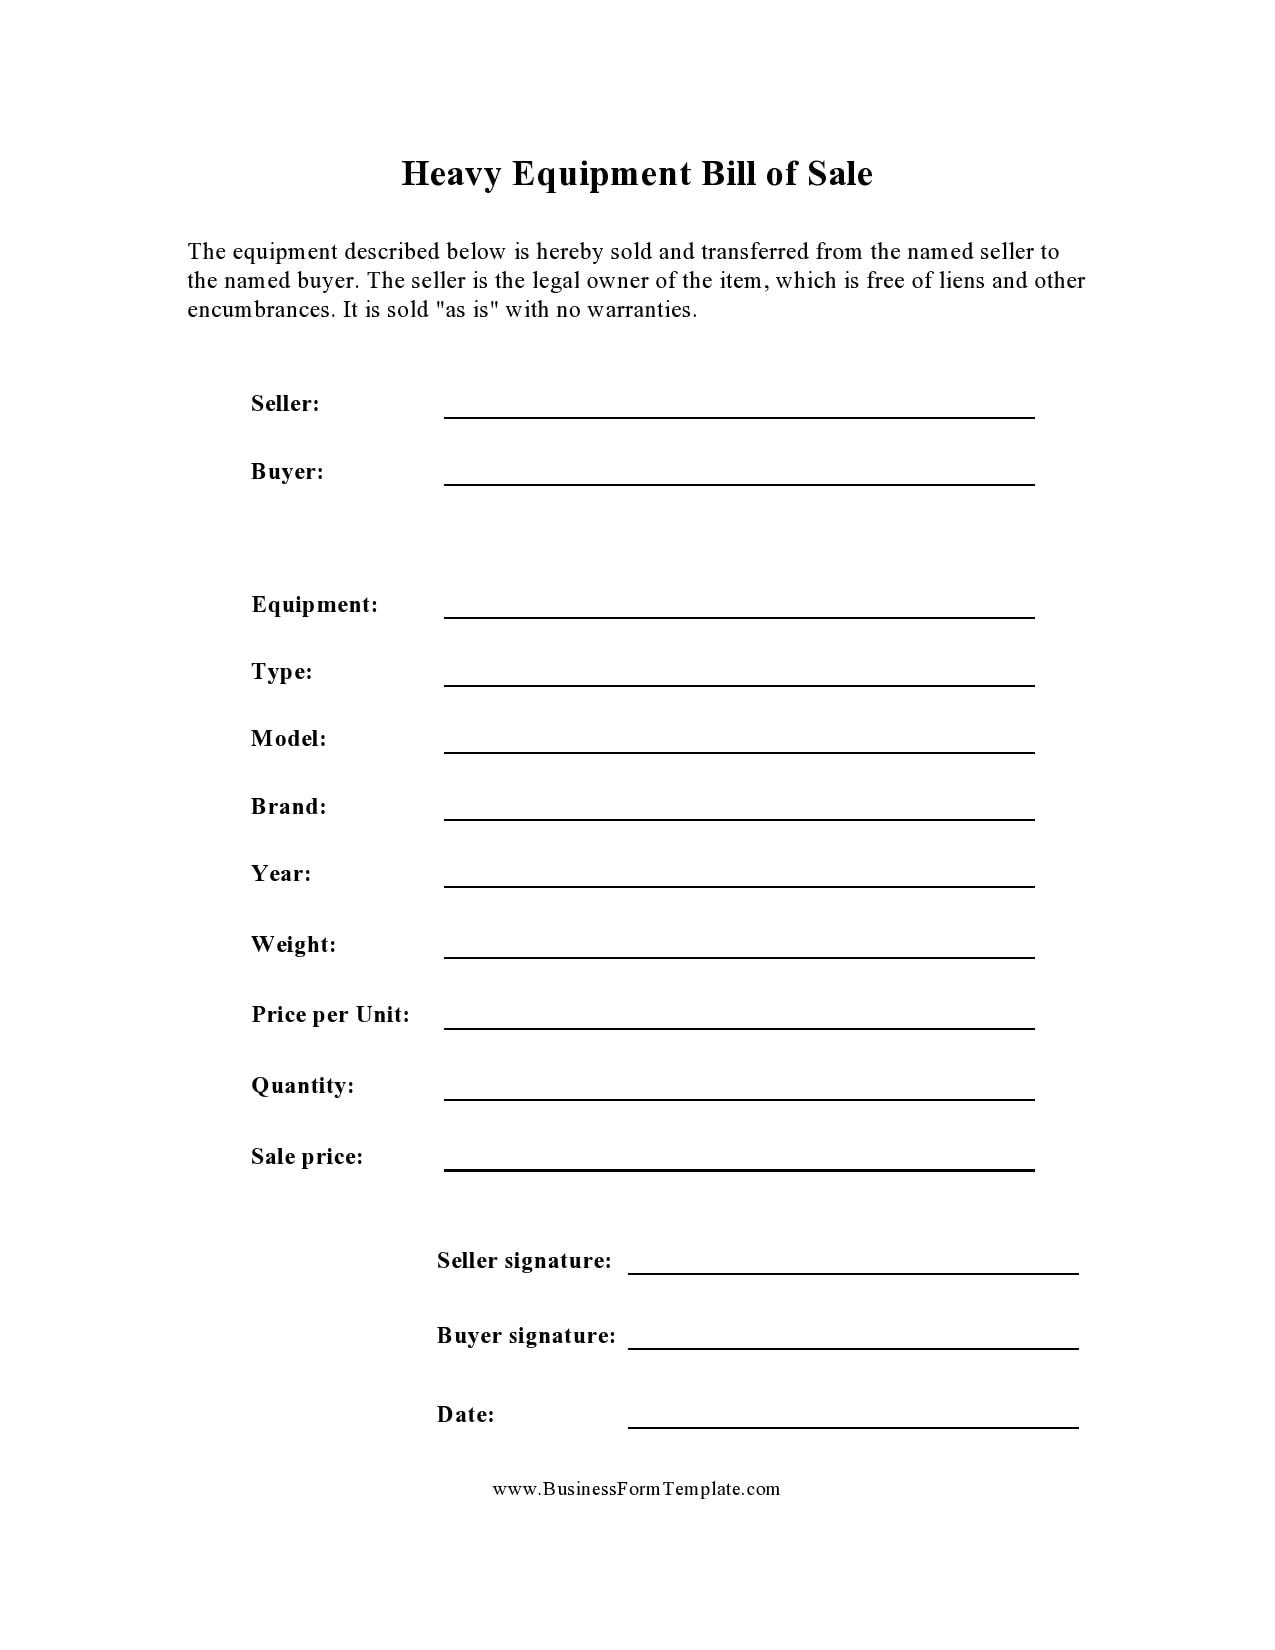 30 Free Equipment Bill of Sale Templates Word   PDF ...